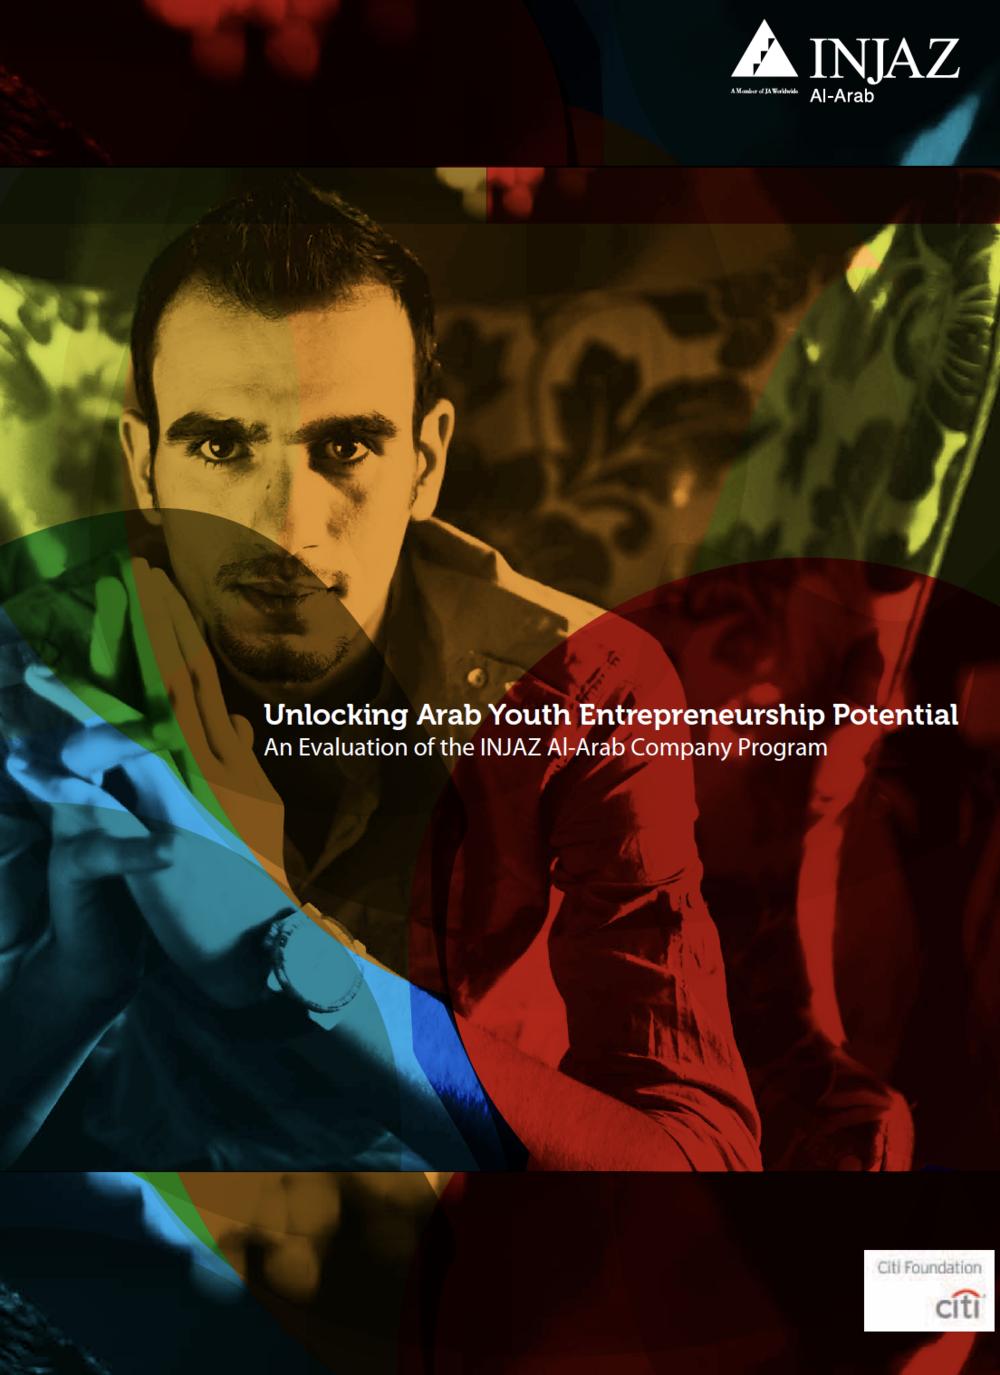 20-2013+INJAZ+Al-Arab+Evaluation+Report-cover.png